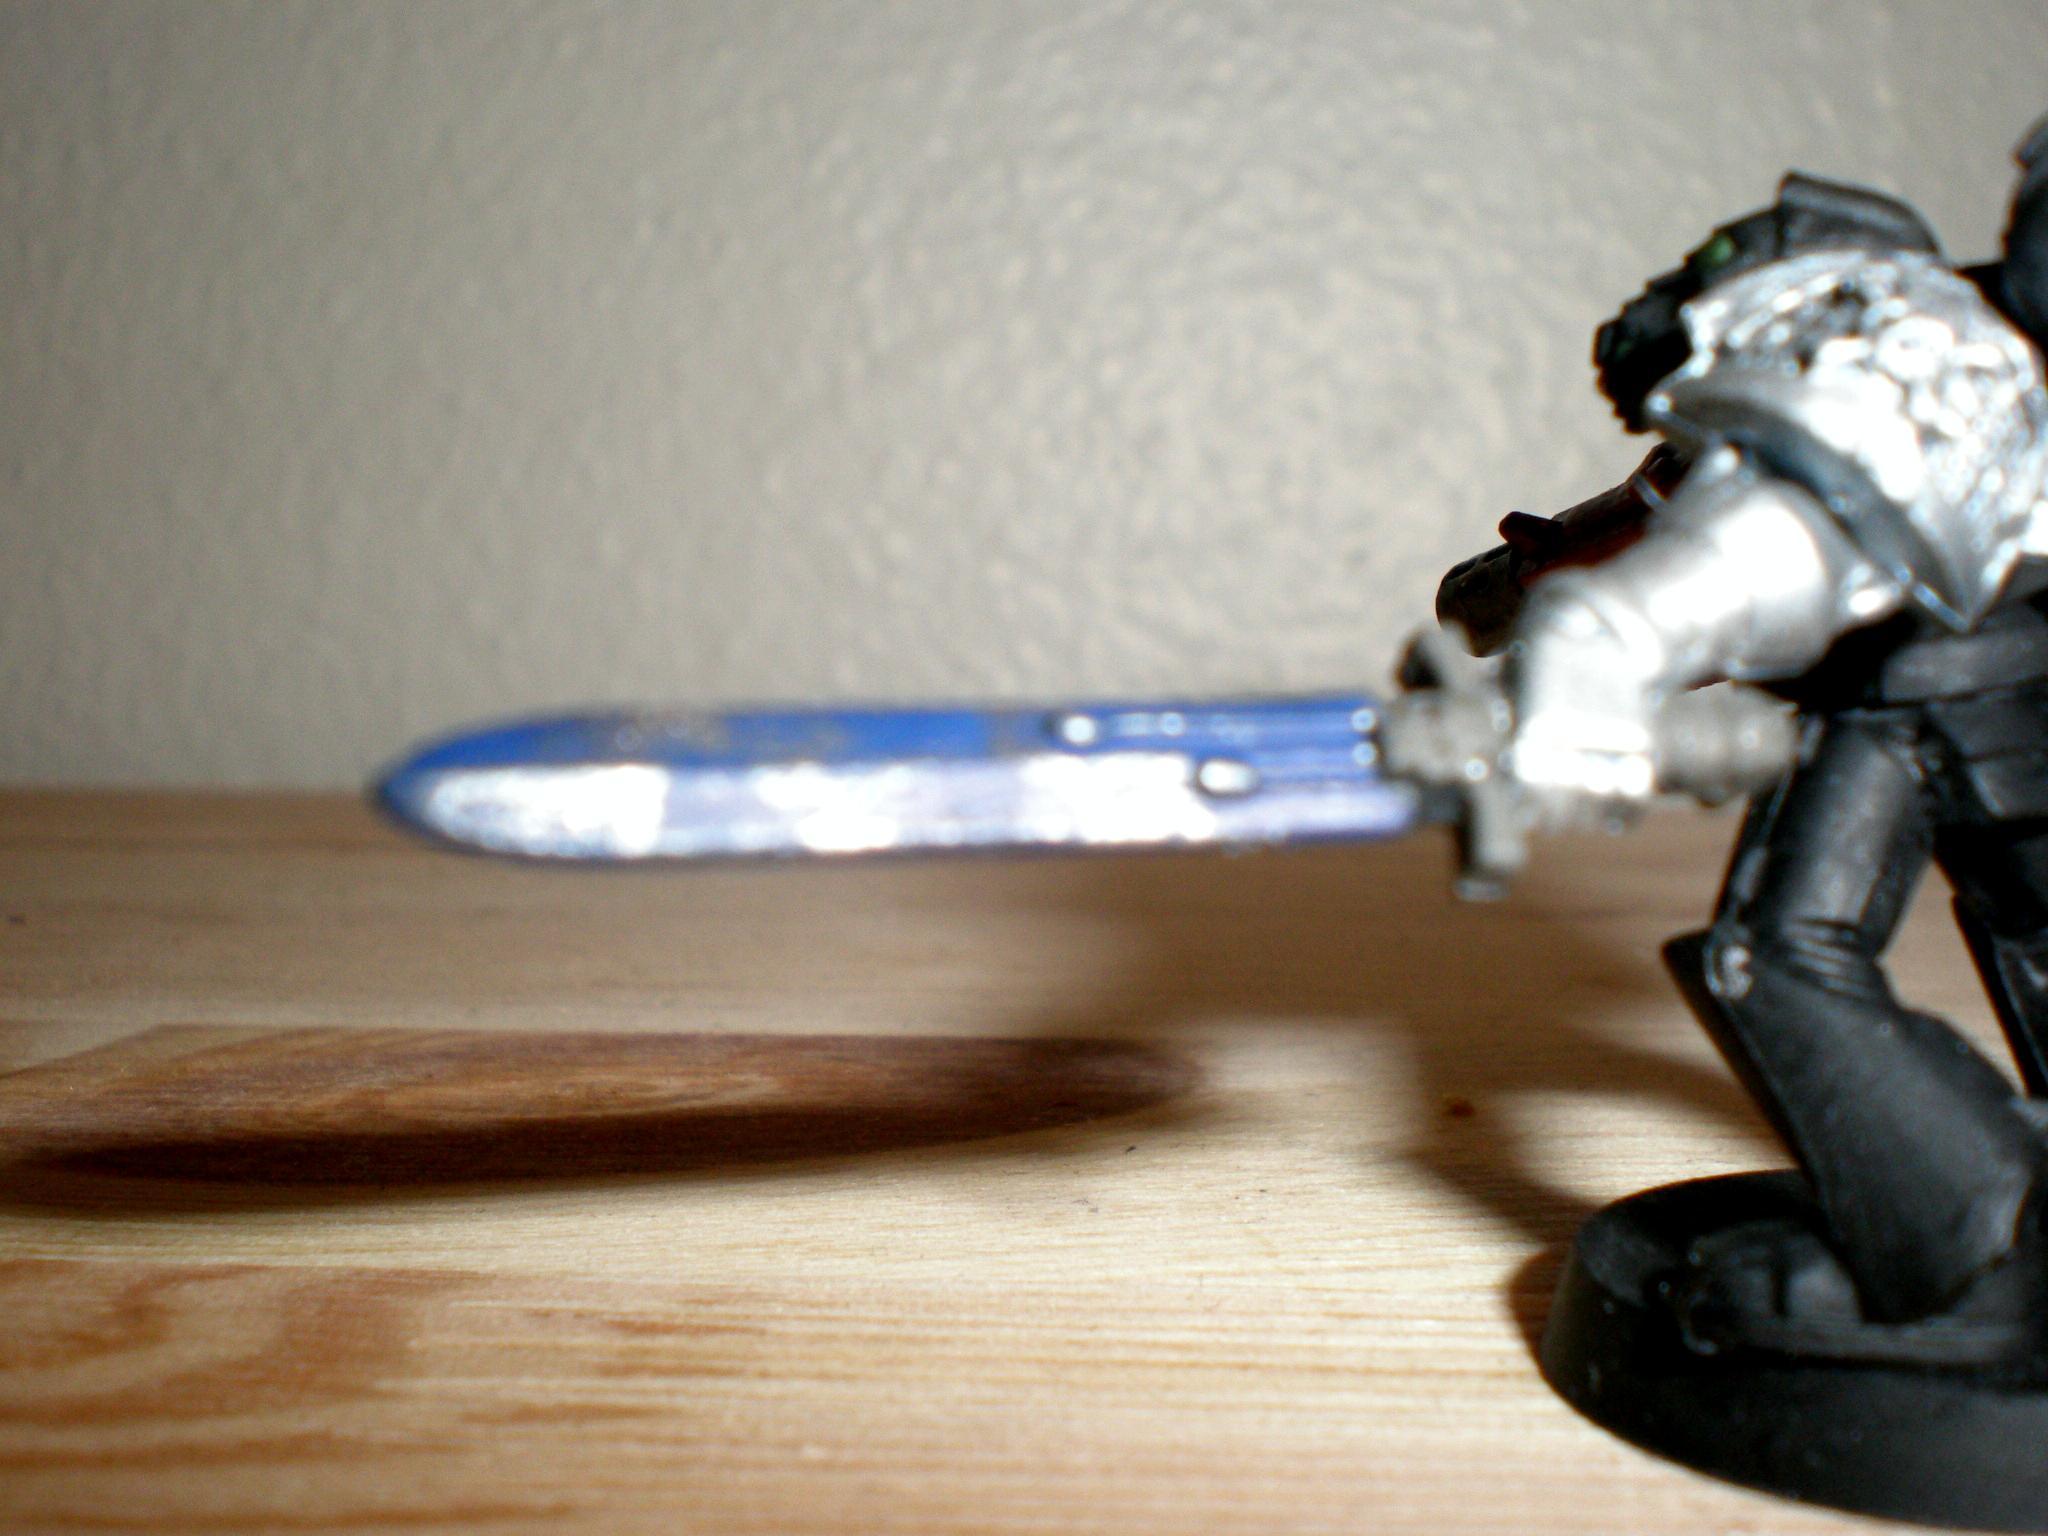 sargeant 1 sword